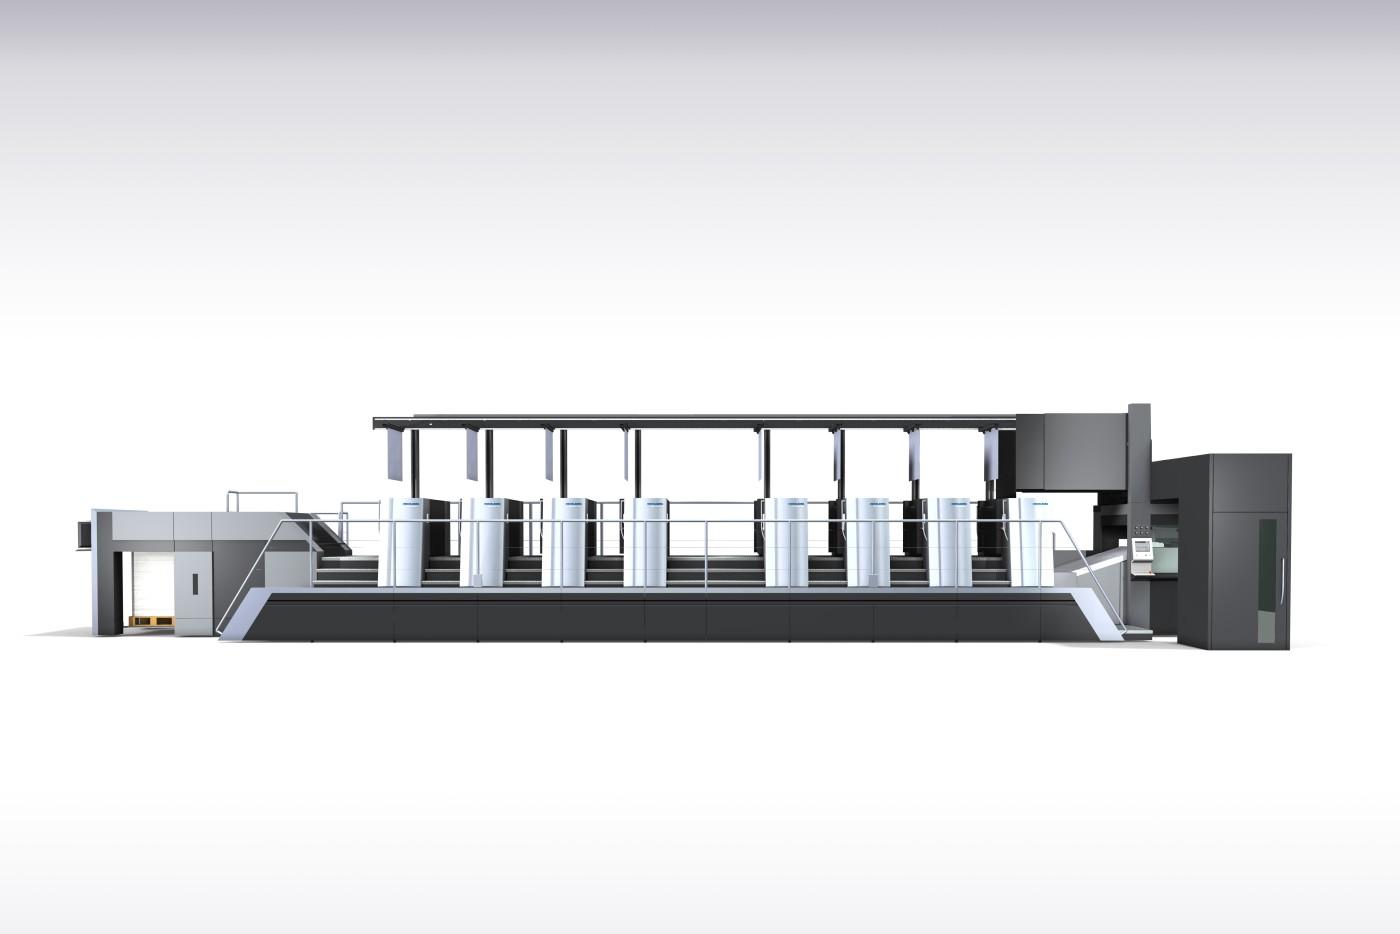 20200130_speedmaster_xl106_plate-to-unit_new